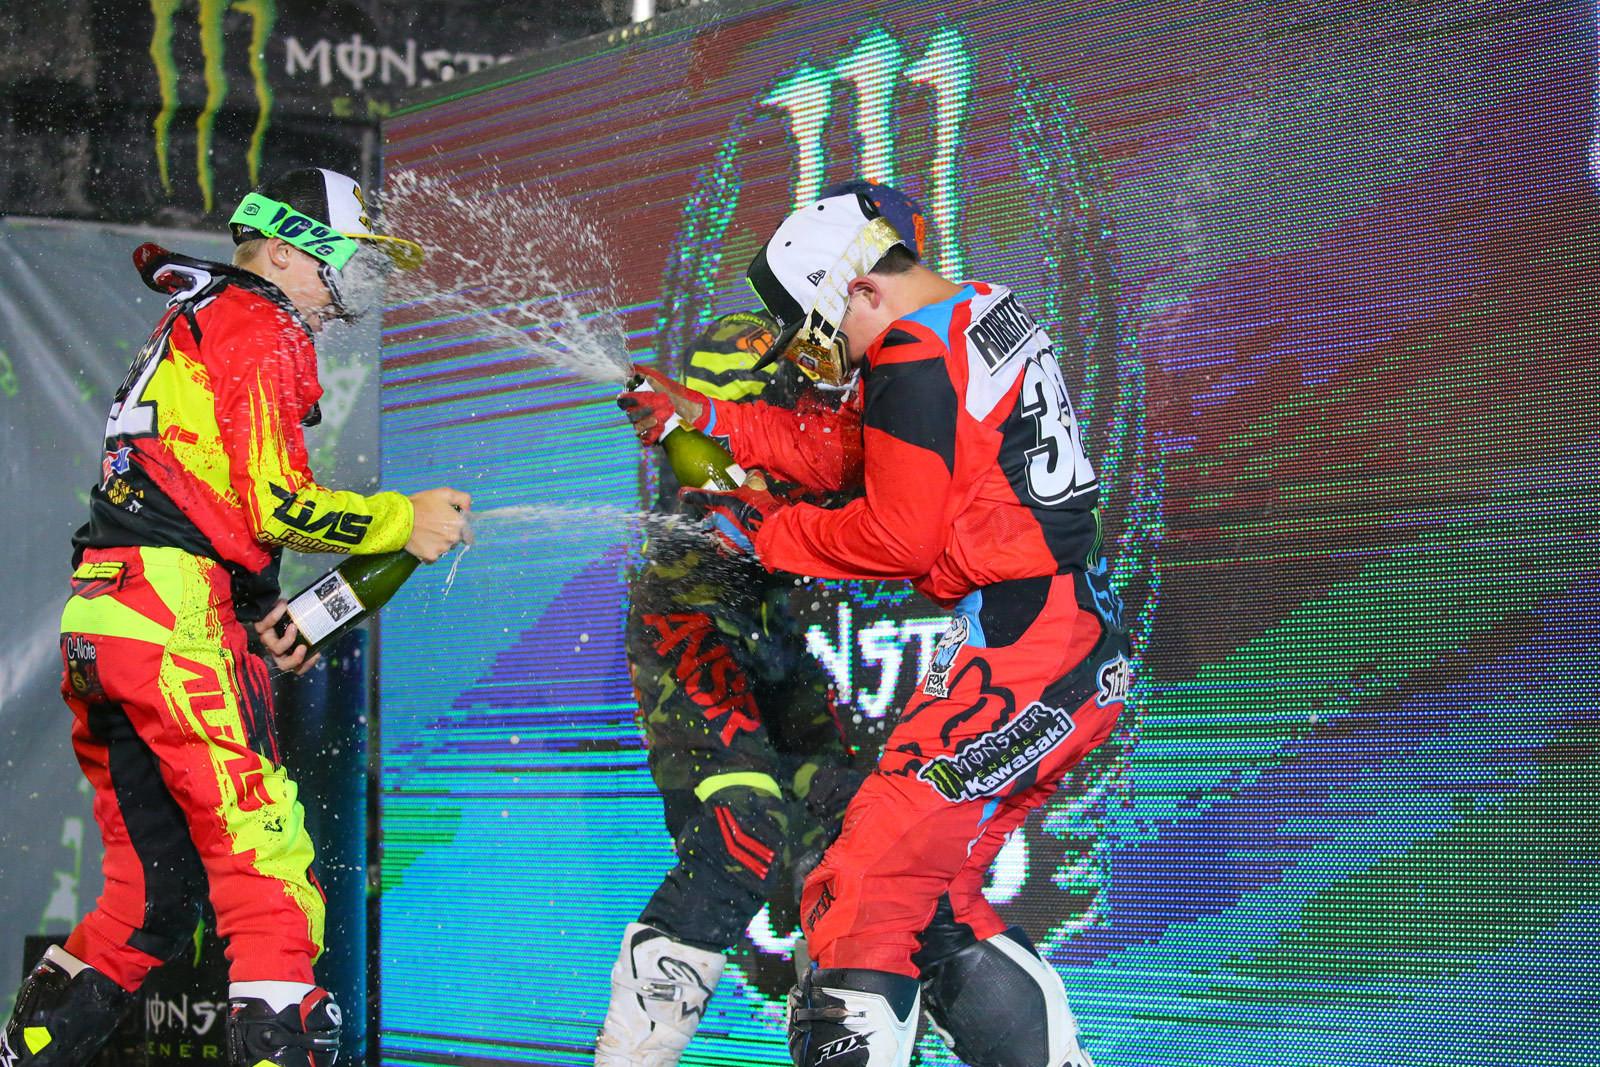 Martinelli battle - Photo Blast: Monster Energy Cup - Motocross Pictures - Vital MX